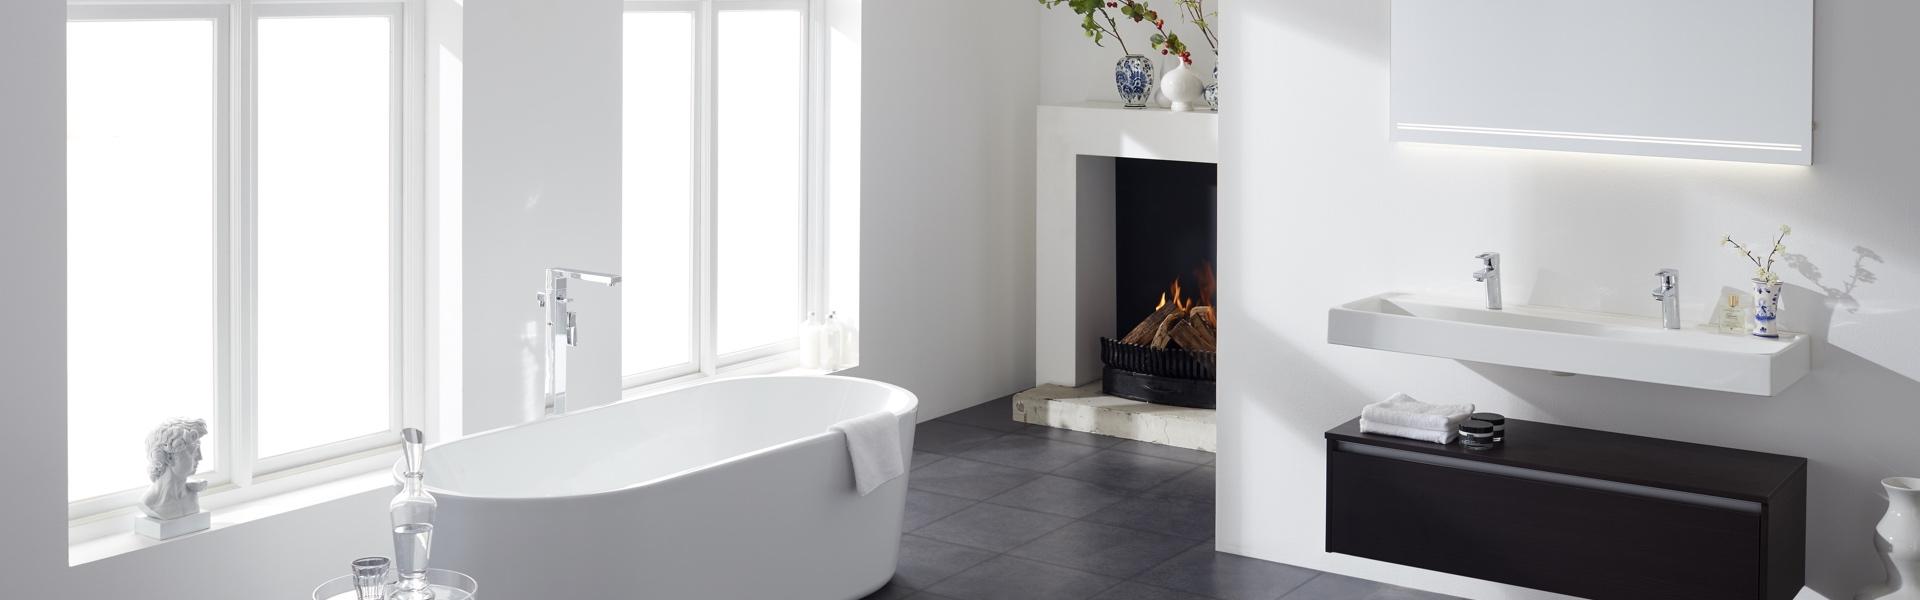 stijl-badkamer-mijnbad-in-stijl-header